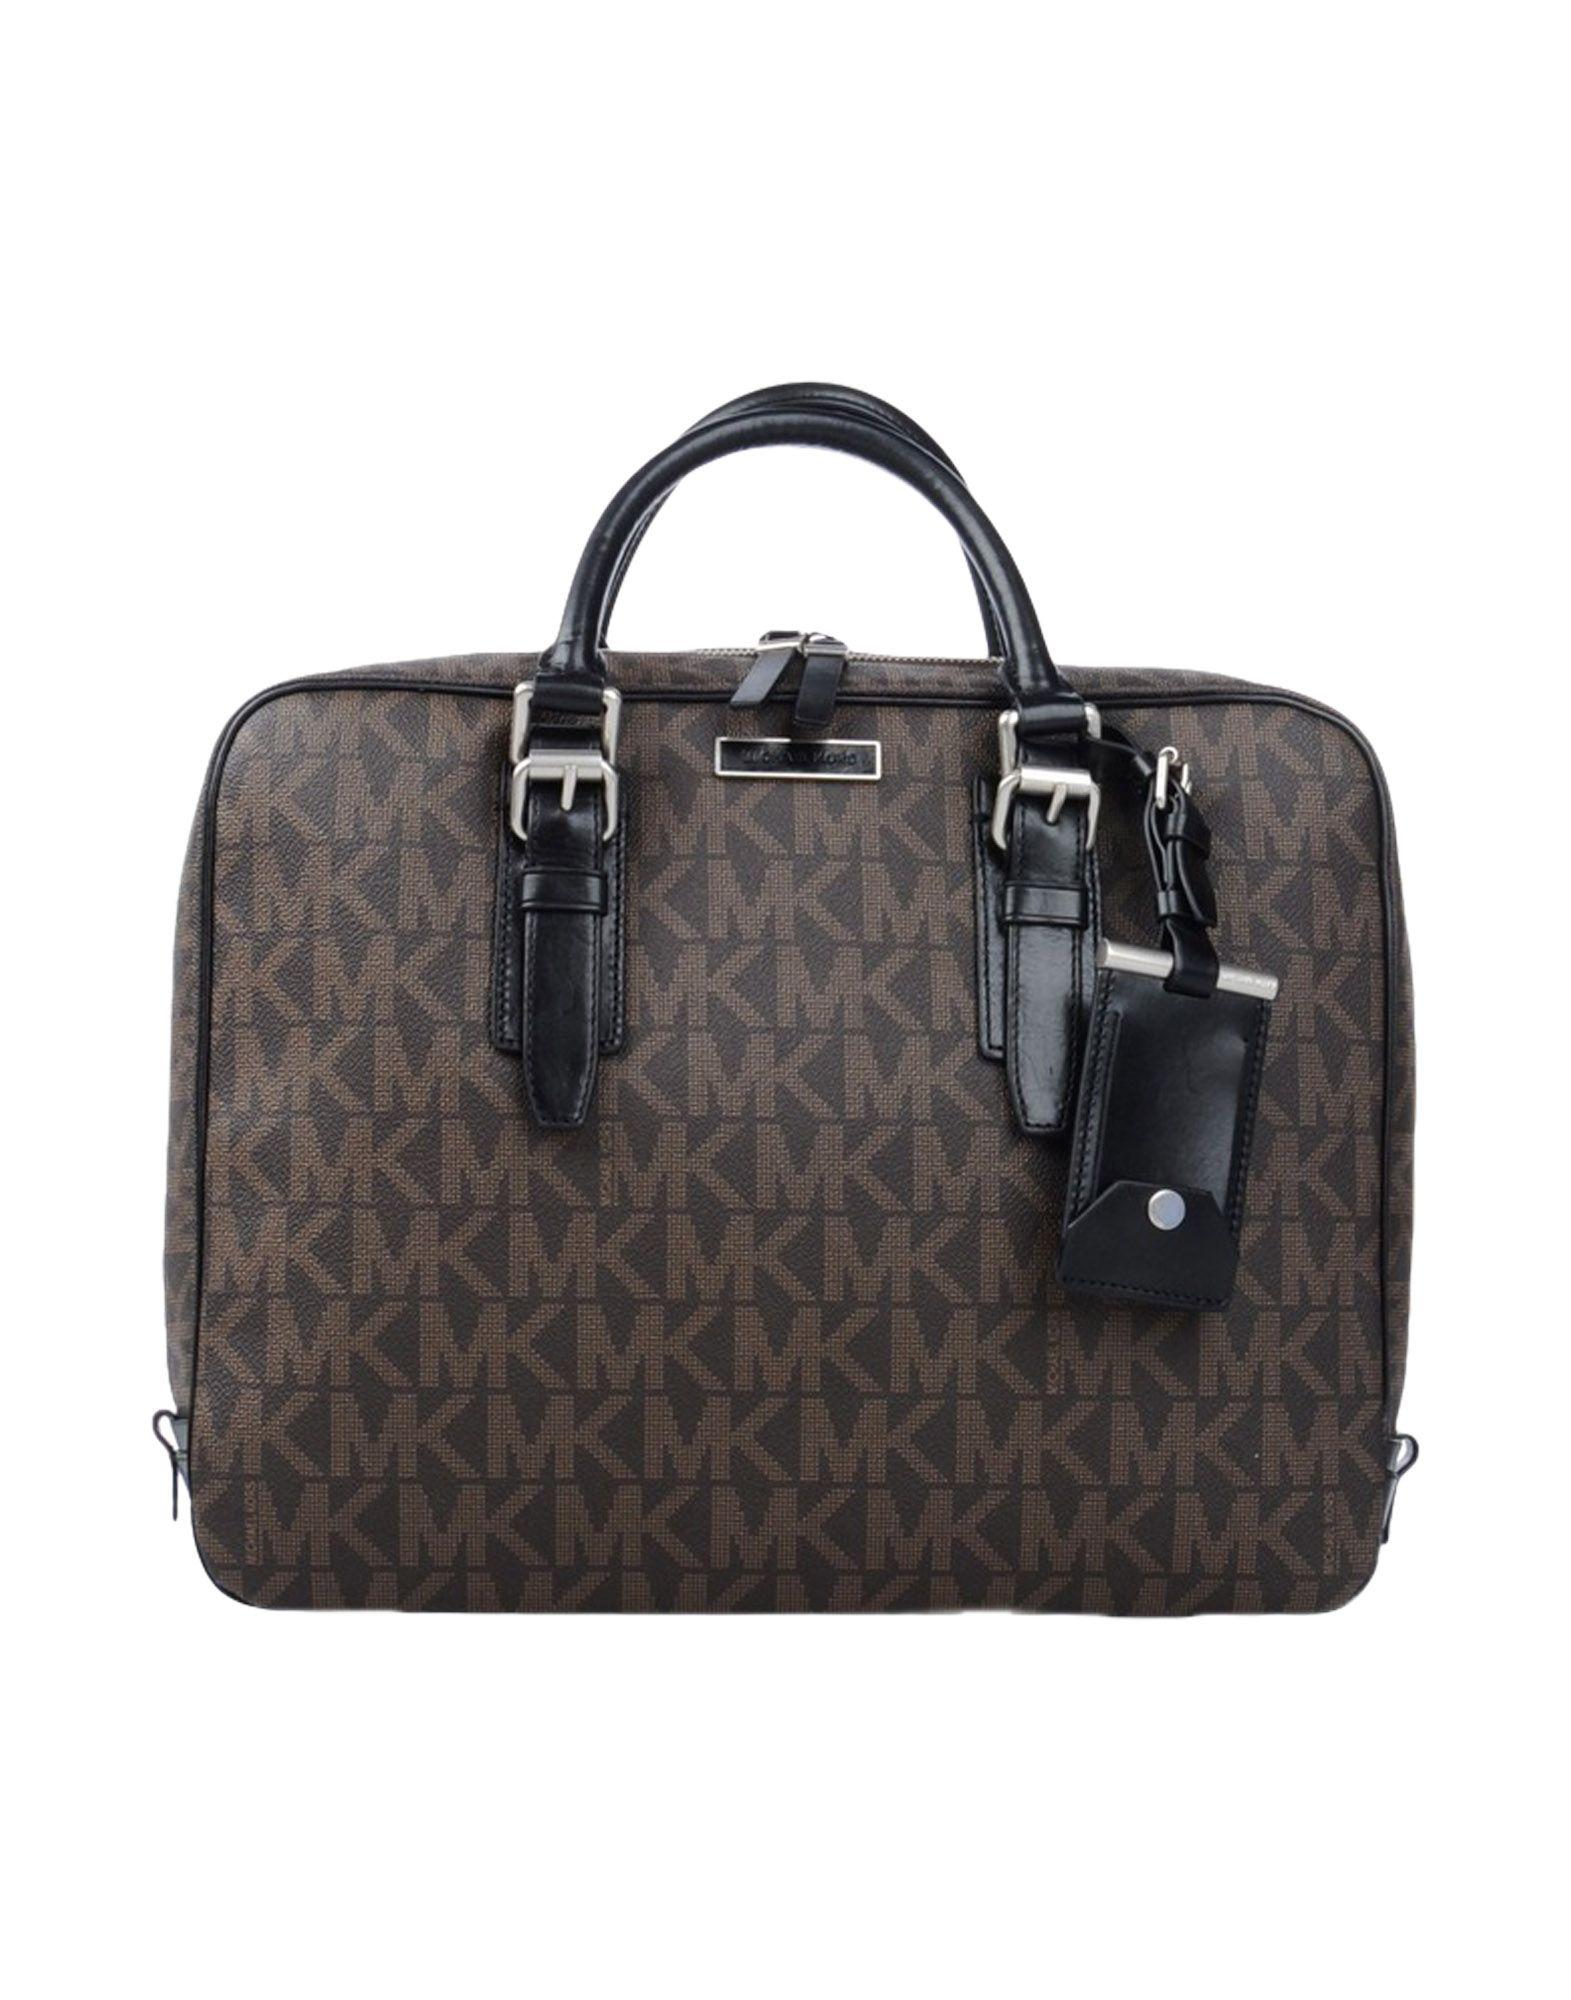 michael kors handbag in brown dark brown lyst. Black Bedroom Furniture Sets. Home Design Ideas